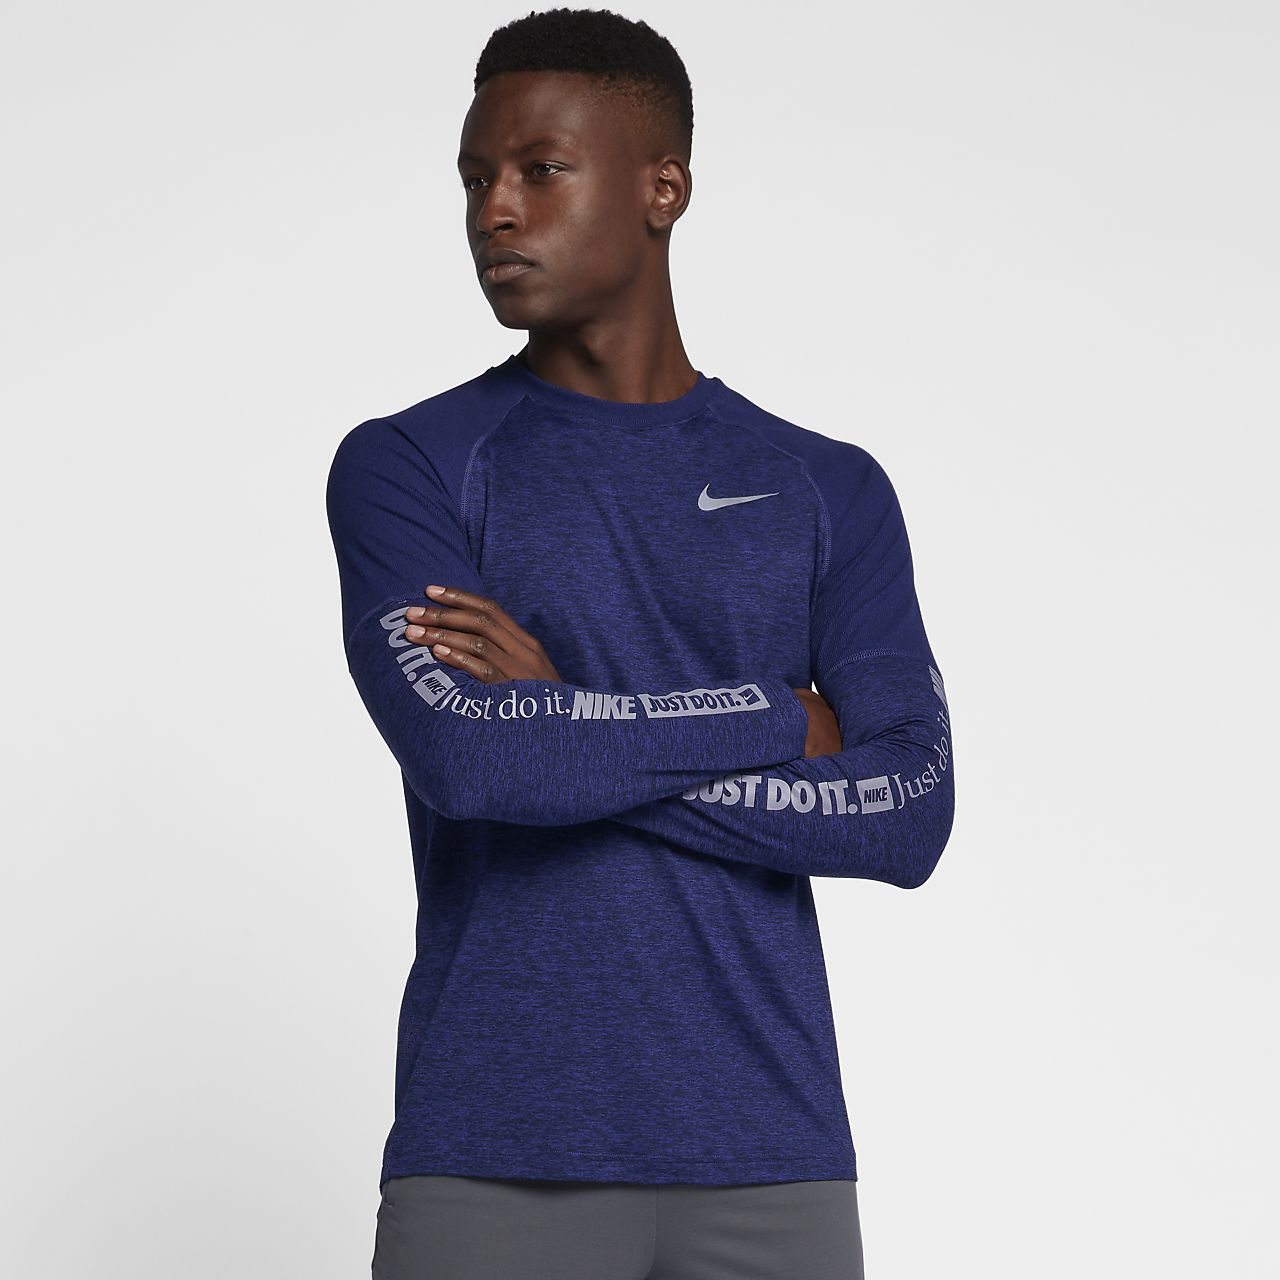 35ff1660ed0 Nike Hardloopshirt met lange mouwen en ronde hals voor heren. Nike ...